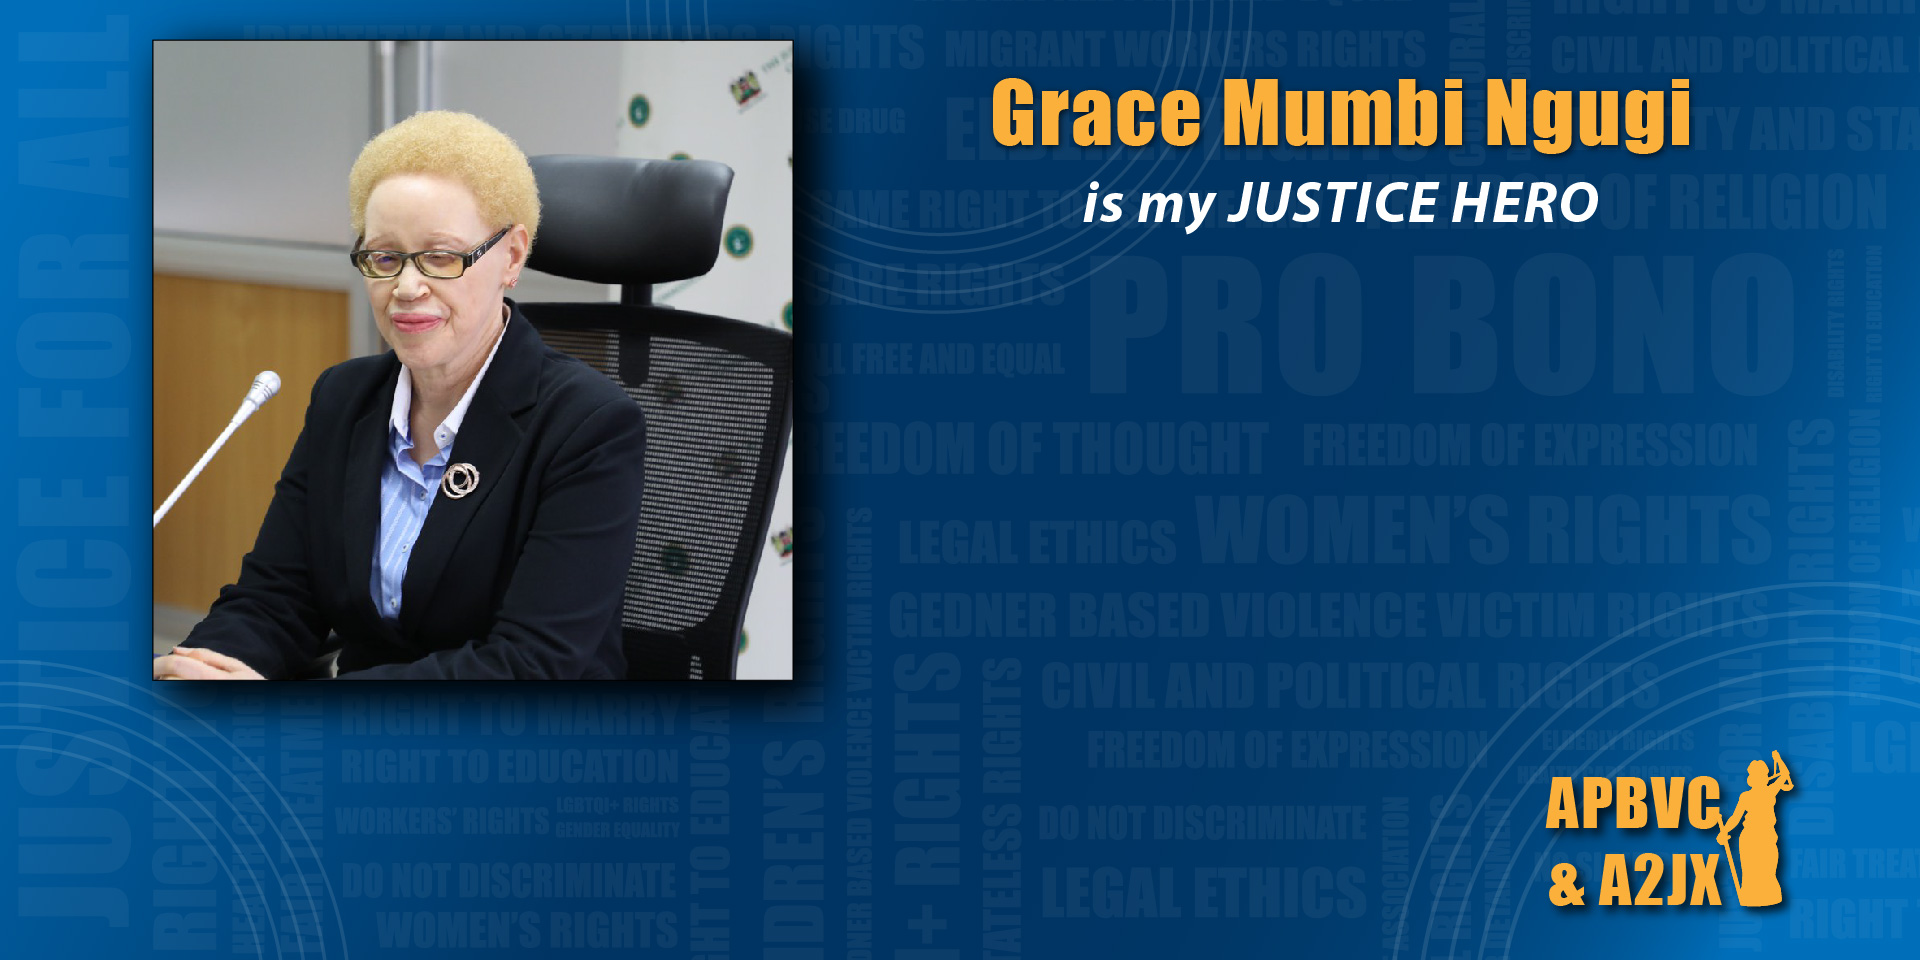 Grace Mumbi Ngugi